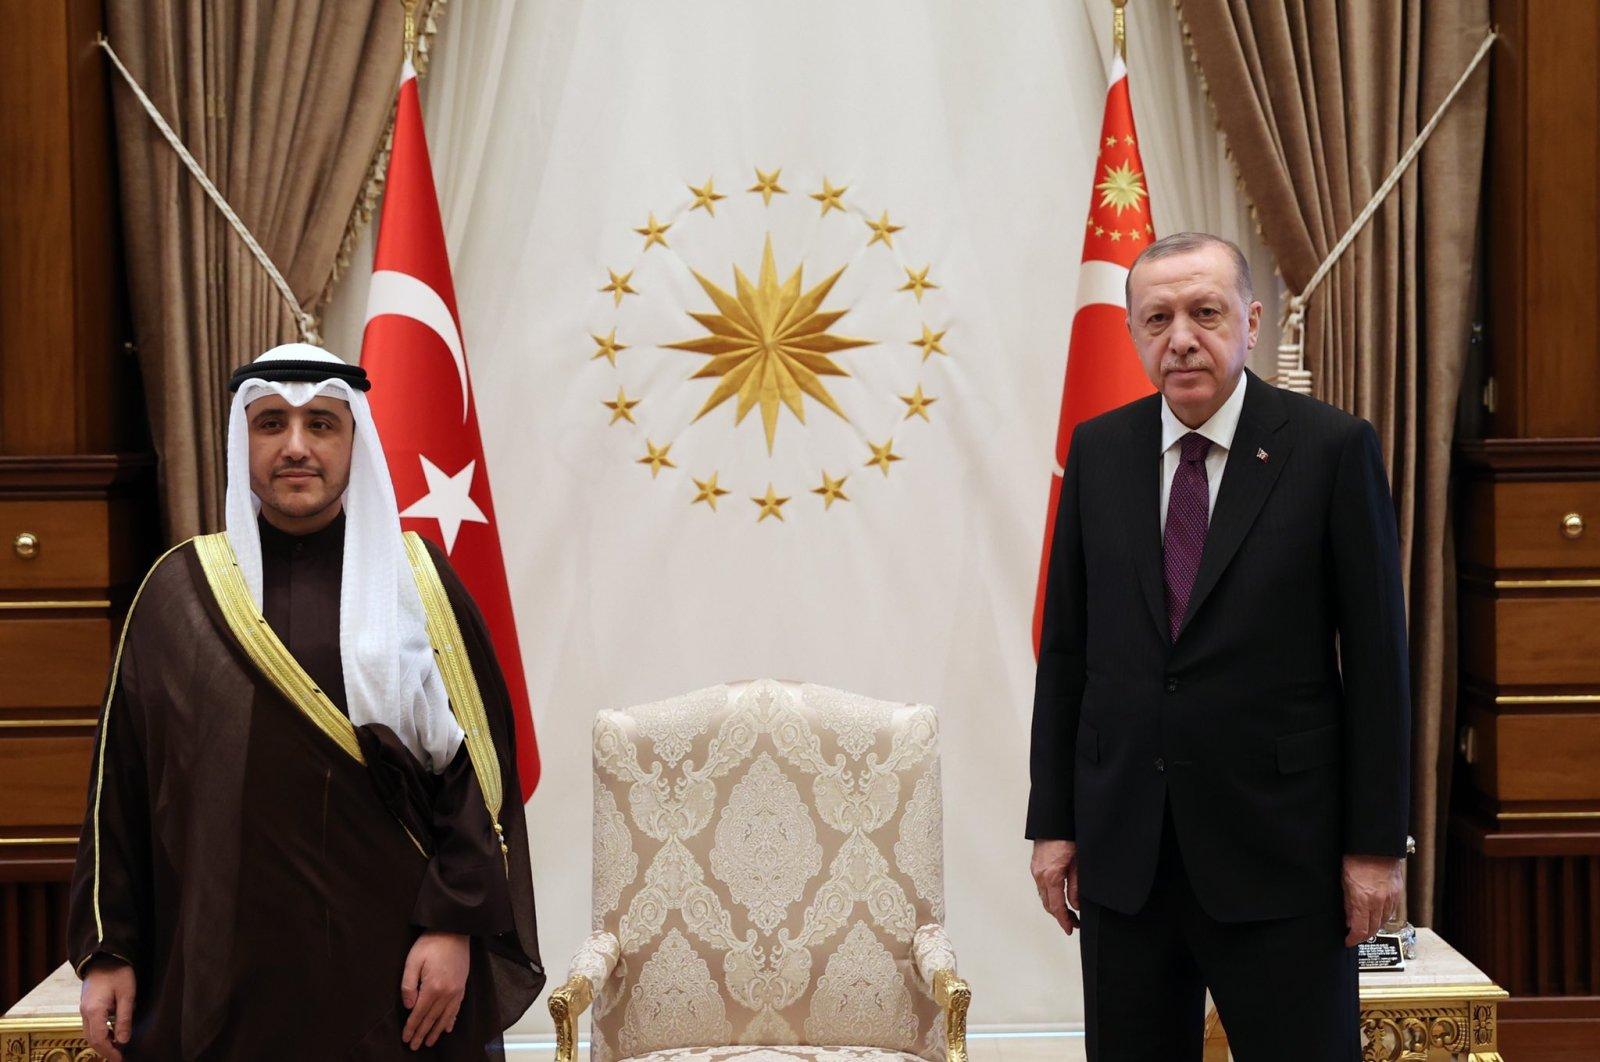 President Recep Tayyip Erdoğan poses with Kuwaiti FM Sheikh Ahmad Nasser al-Sabah at the Presidential Complex in Ankara, Turkey, April 8, 2021. (AA Photo)